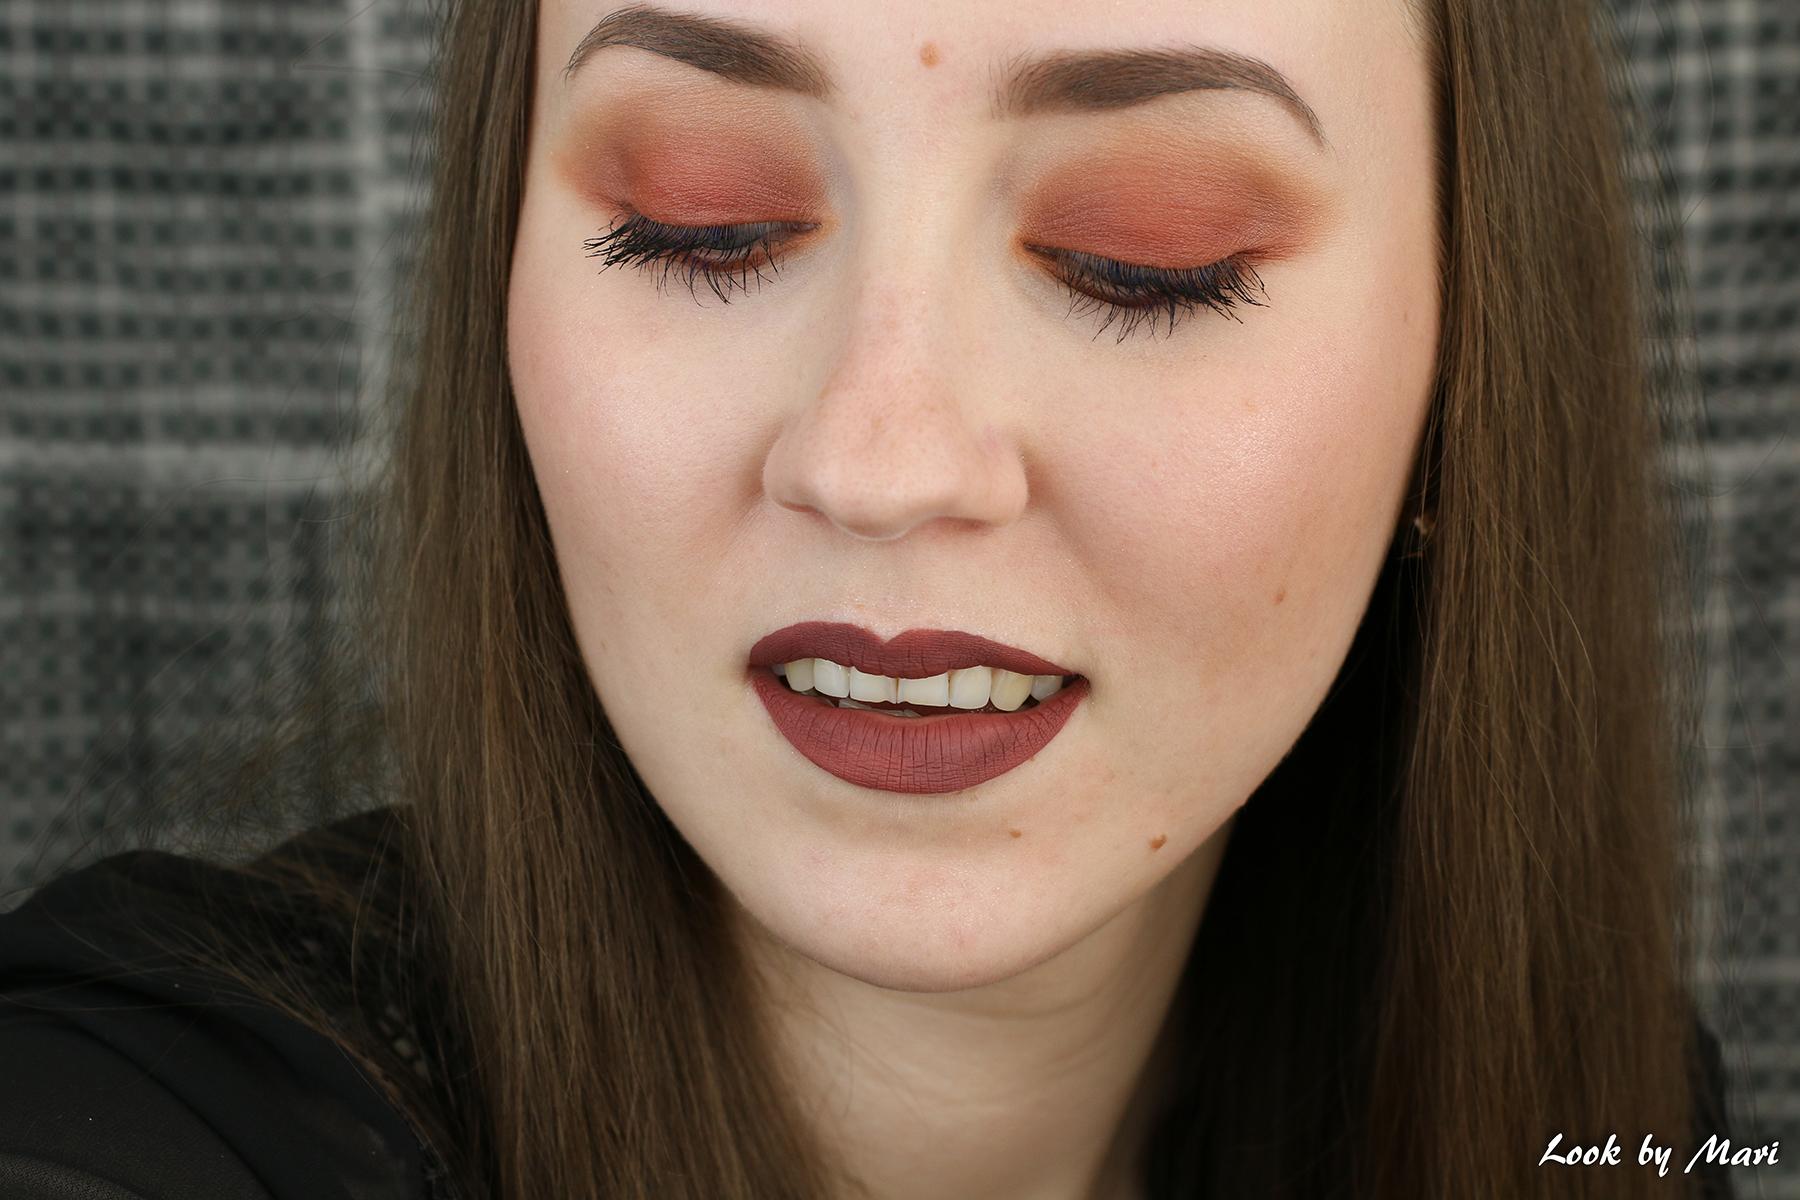 3 abh modern renessaince inspo eye makeup tutorial inspiration kicks suomi hinta kokemuksia